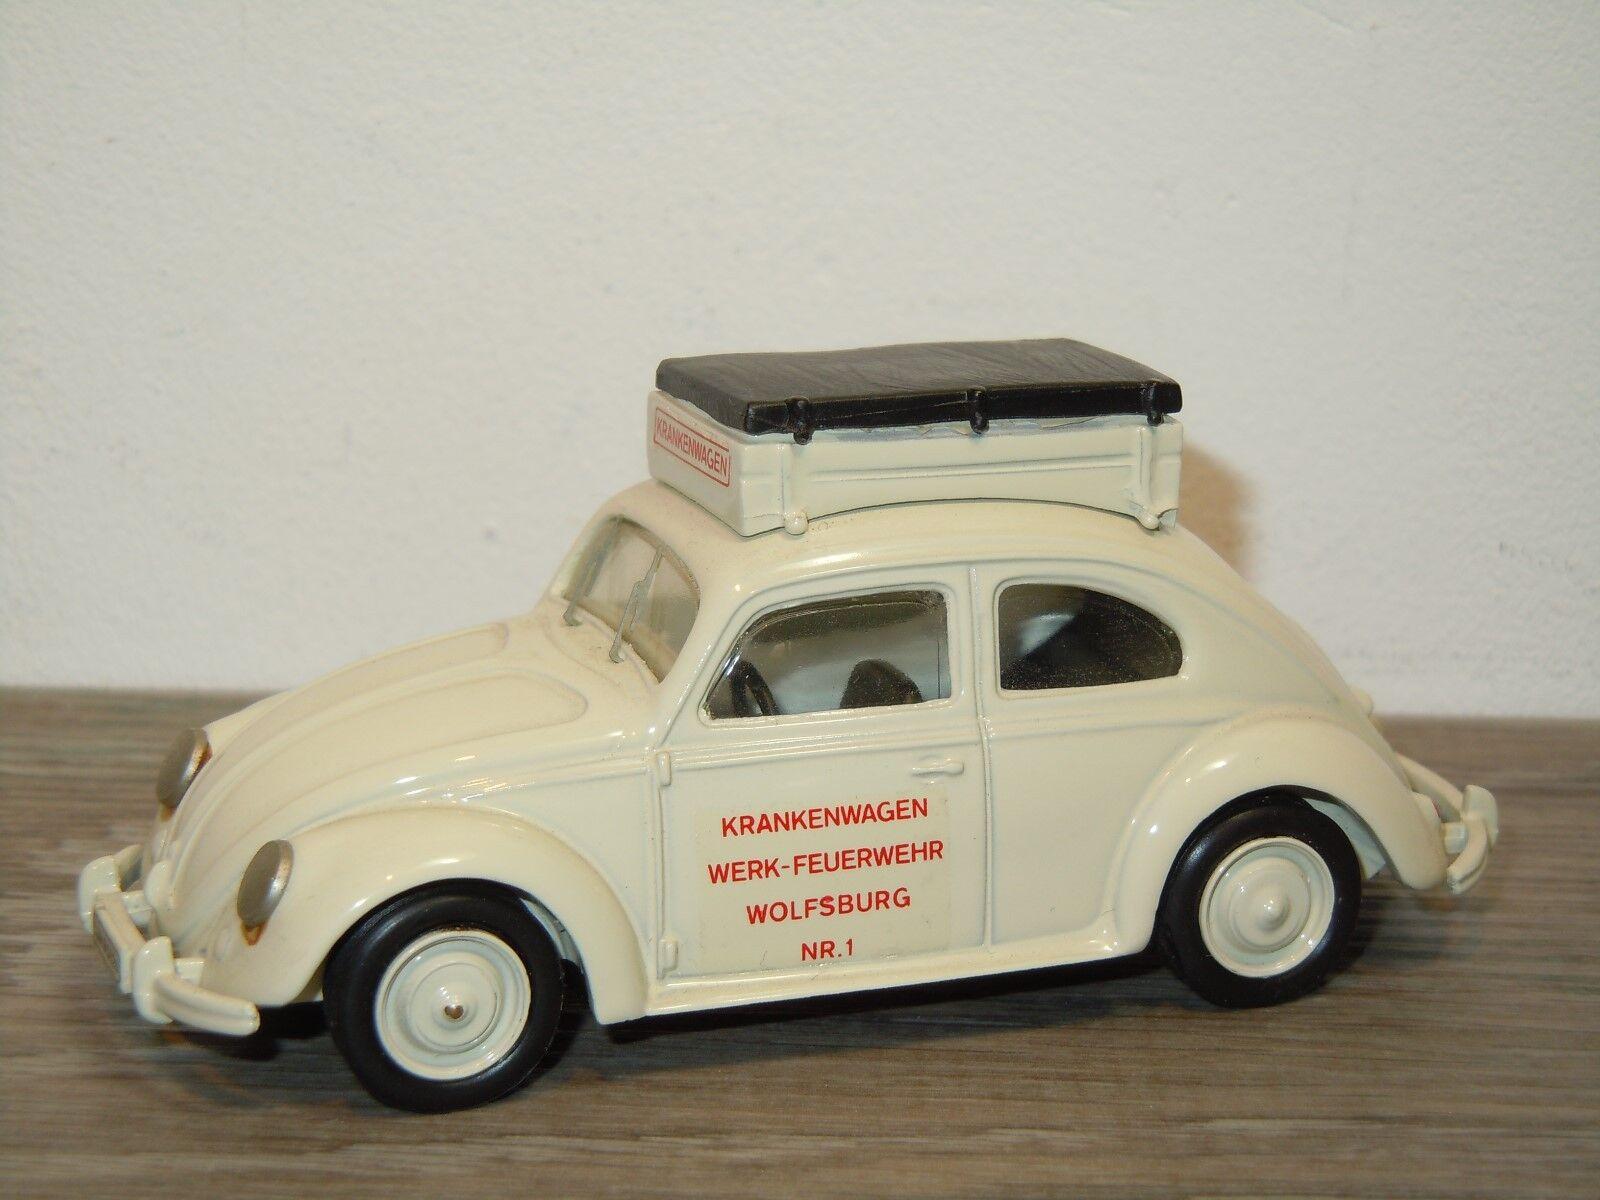 VW Volkswagen Beete Krankenwagen Wolfsburg - AMR Century France 1 43 35085